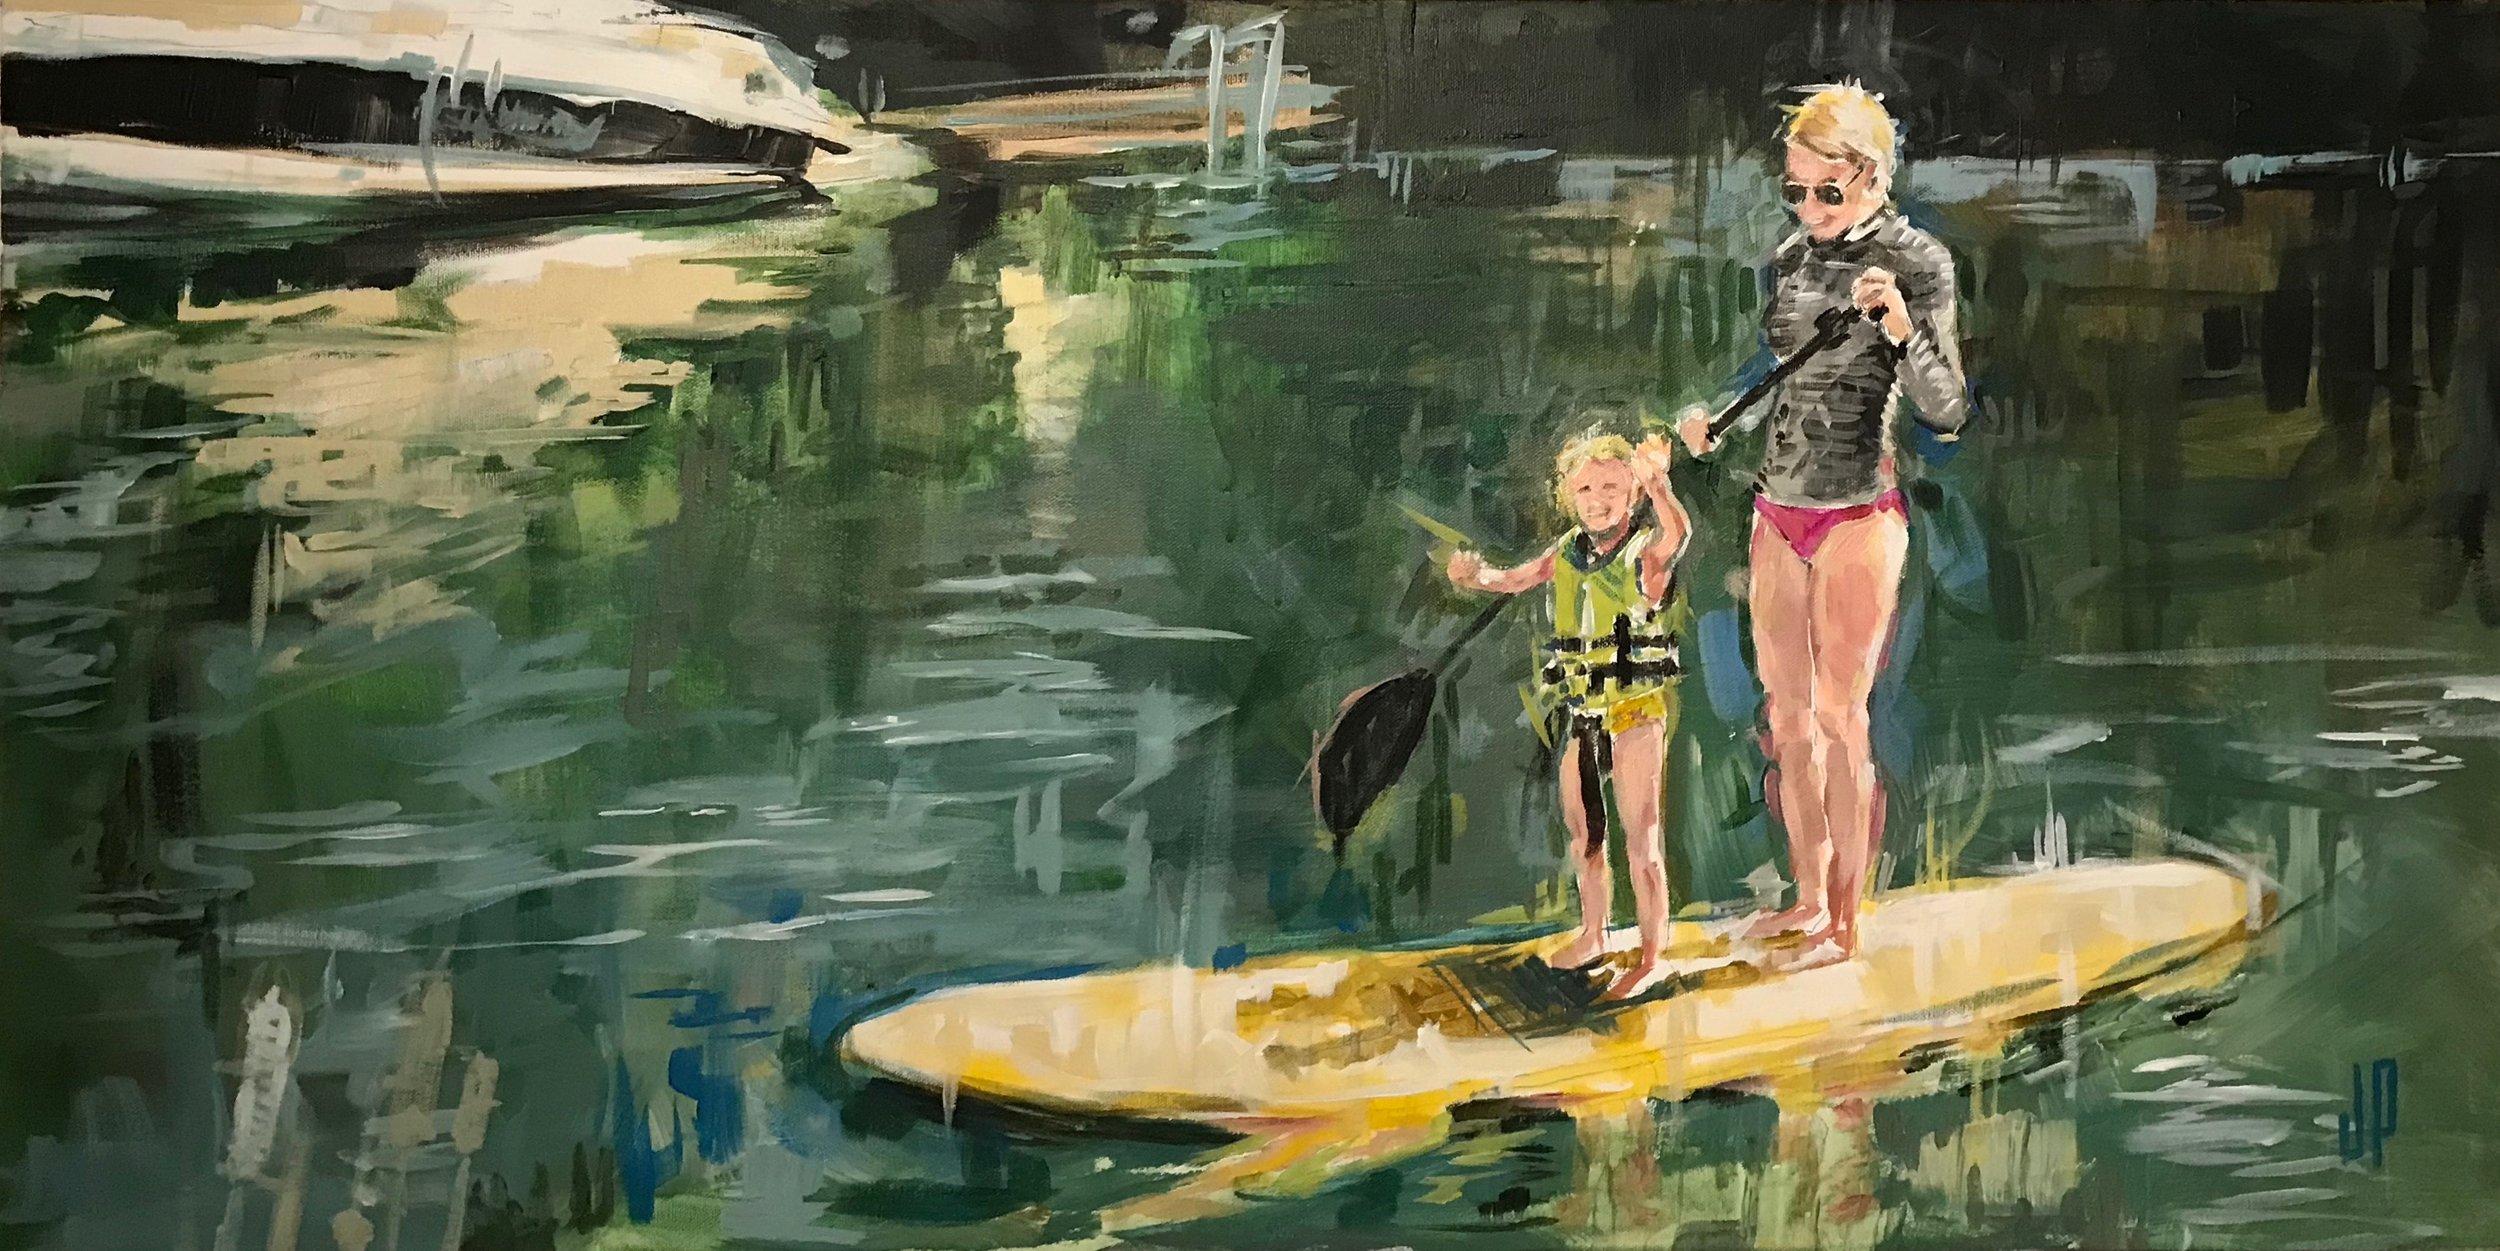 paddleboard_jesse_pierpoint